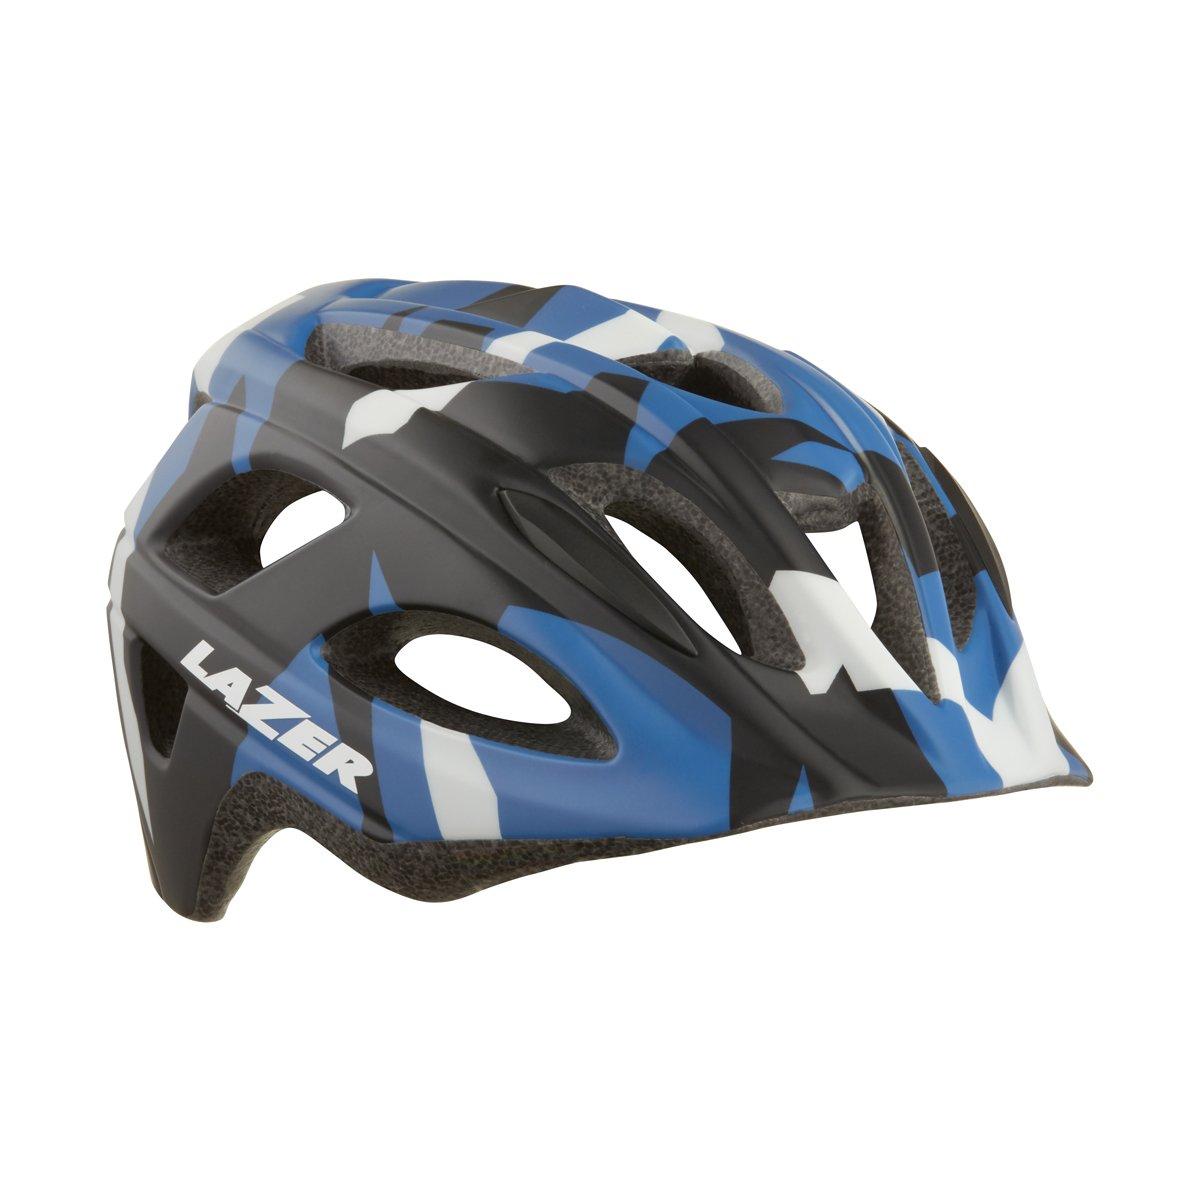 Lazer NUTZ MIPS cykelhjelm blå/camo 50-56 cm | Hjelme